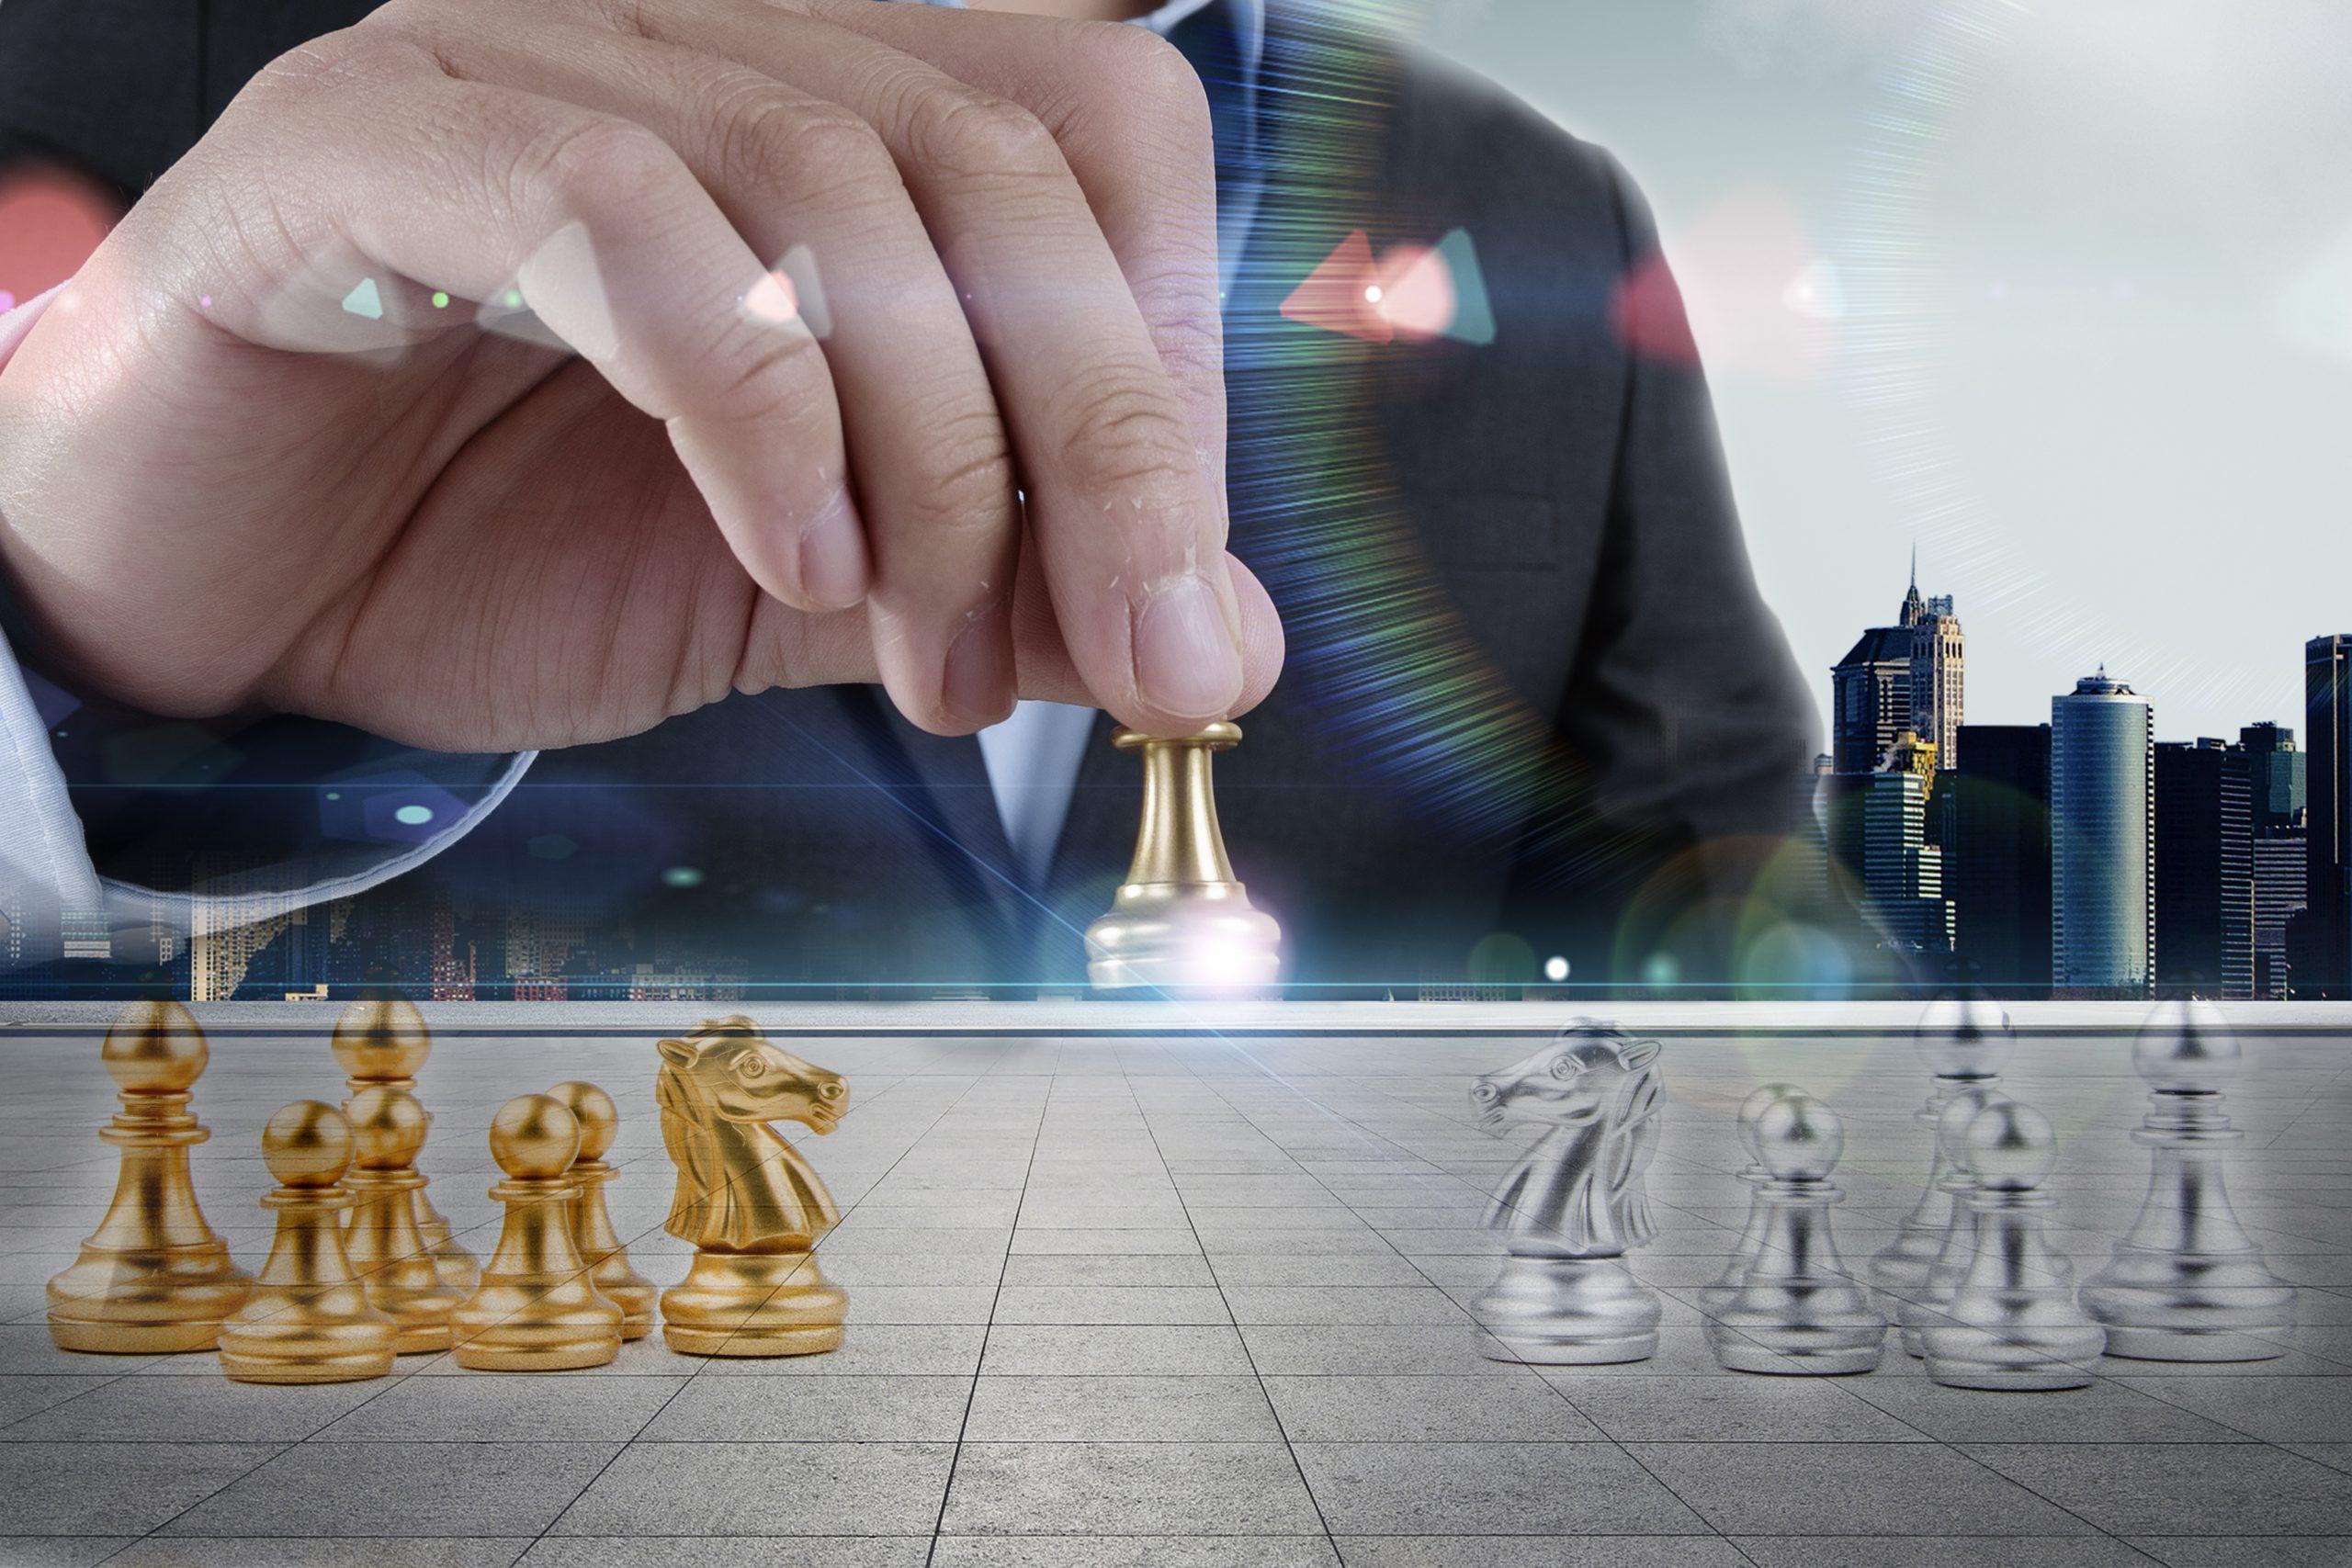 Lovepik_com-500636569-business-chess-board